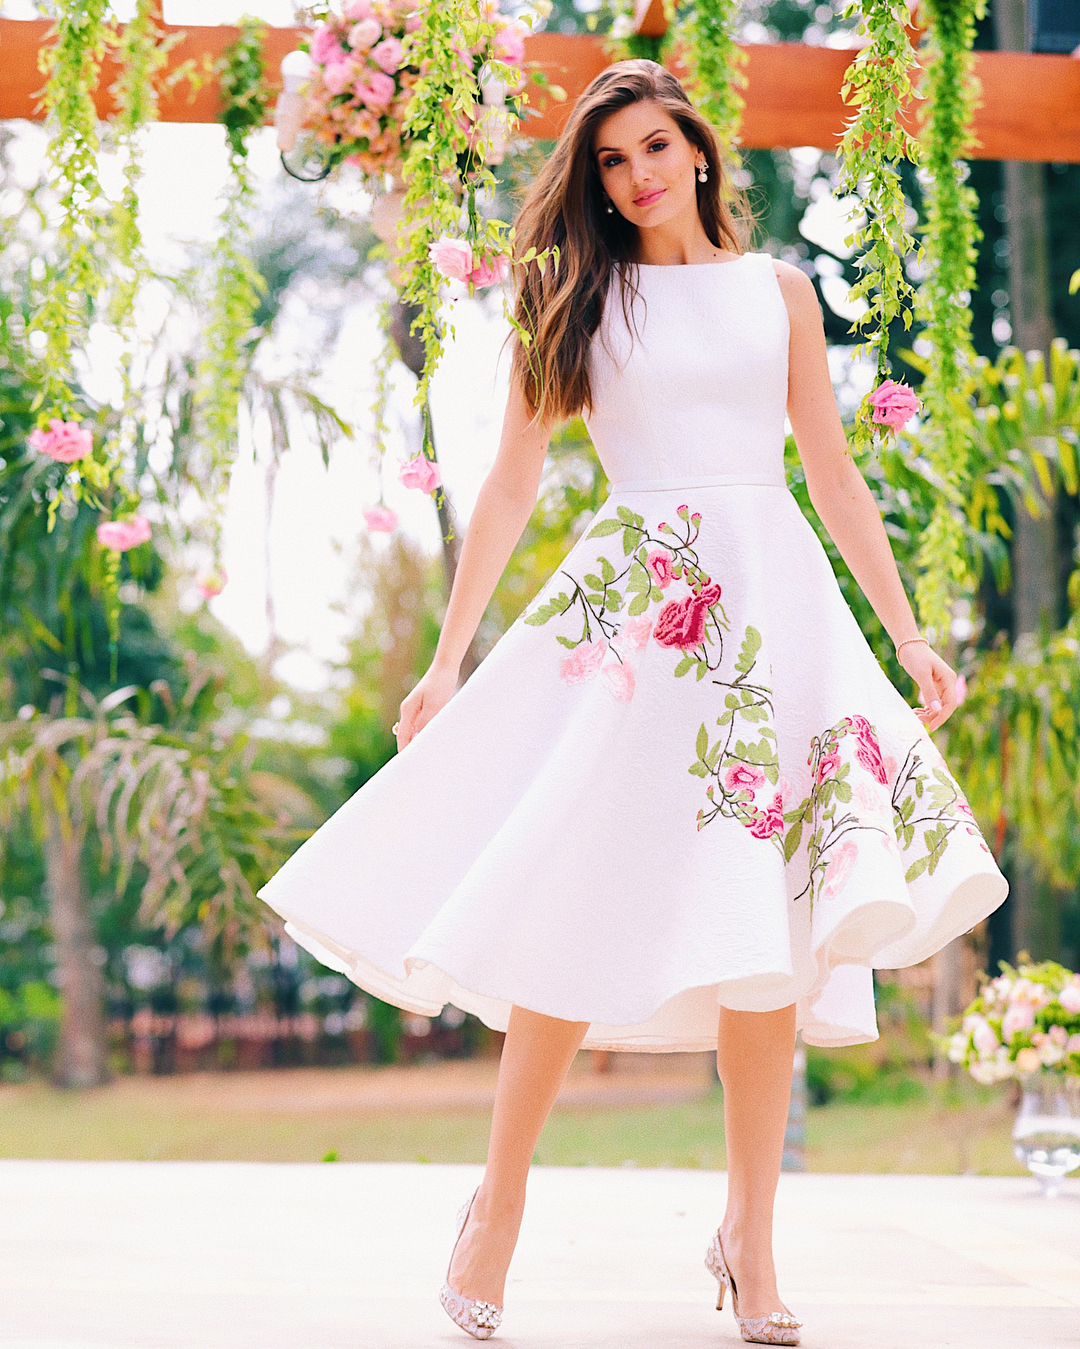 Vestidos: Veja Modelos para Arrasar o Ano Todo